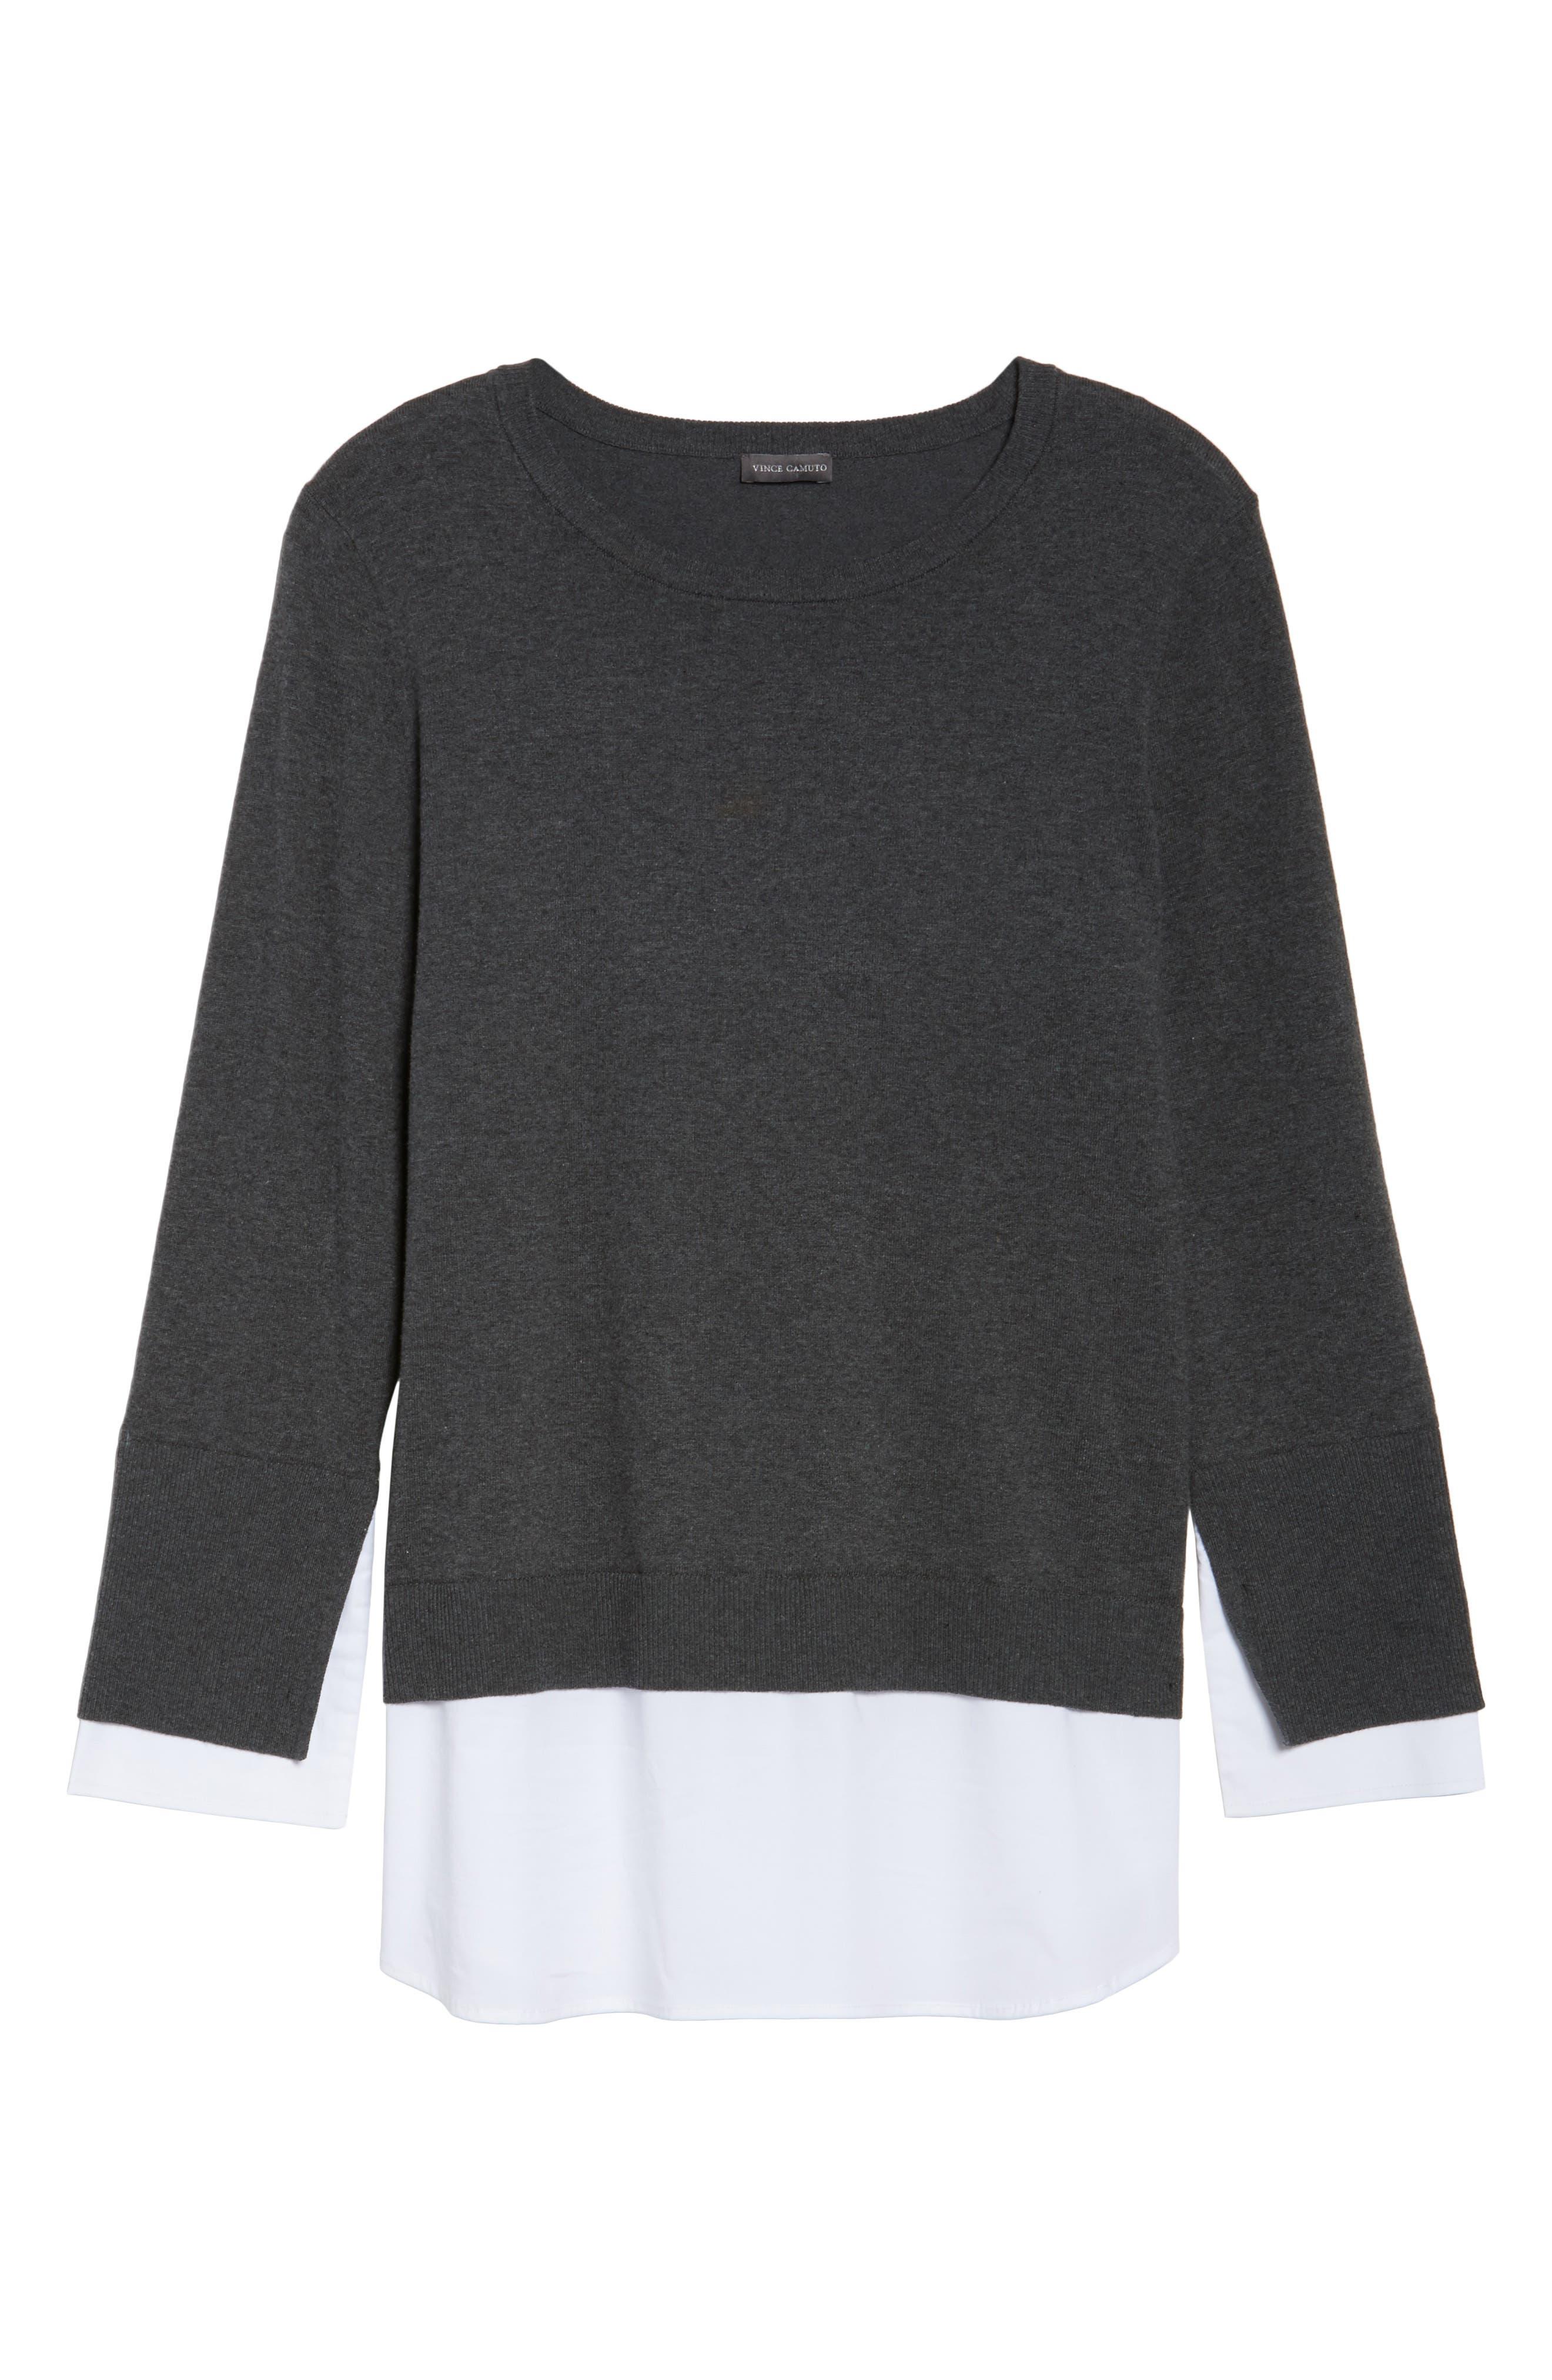 Layered Look Sweater,                             Alternate thumbnail 6, color,                             Medium Heather Grey